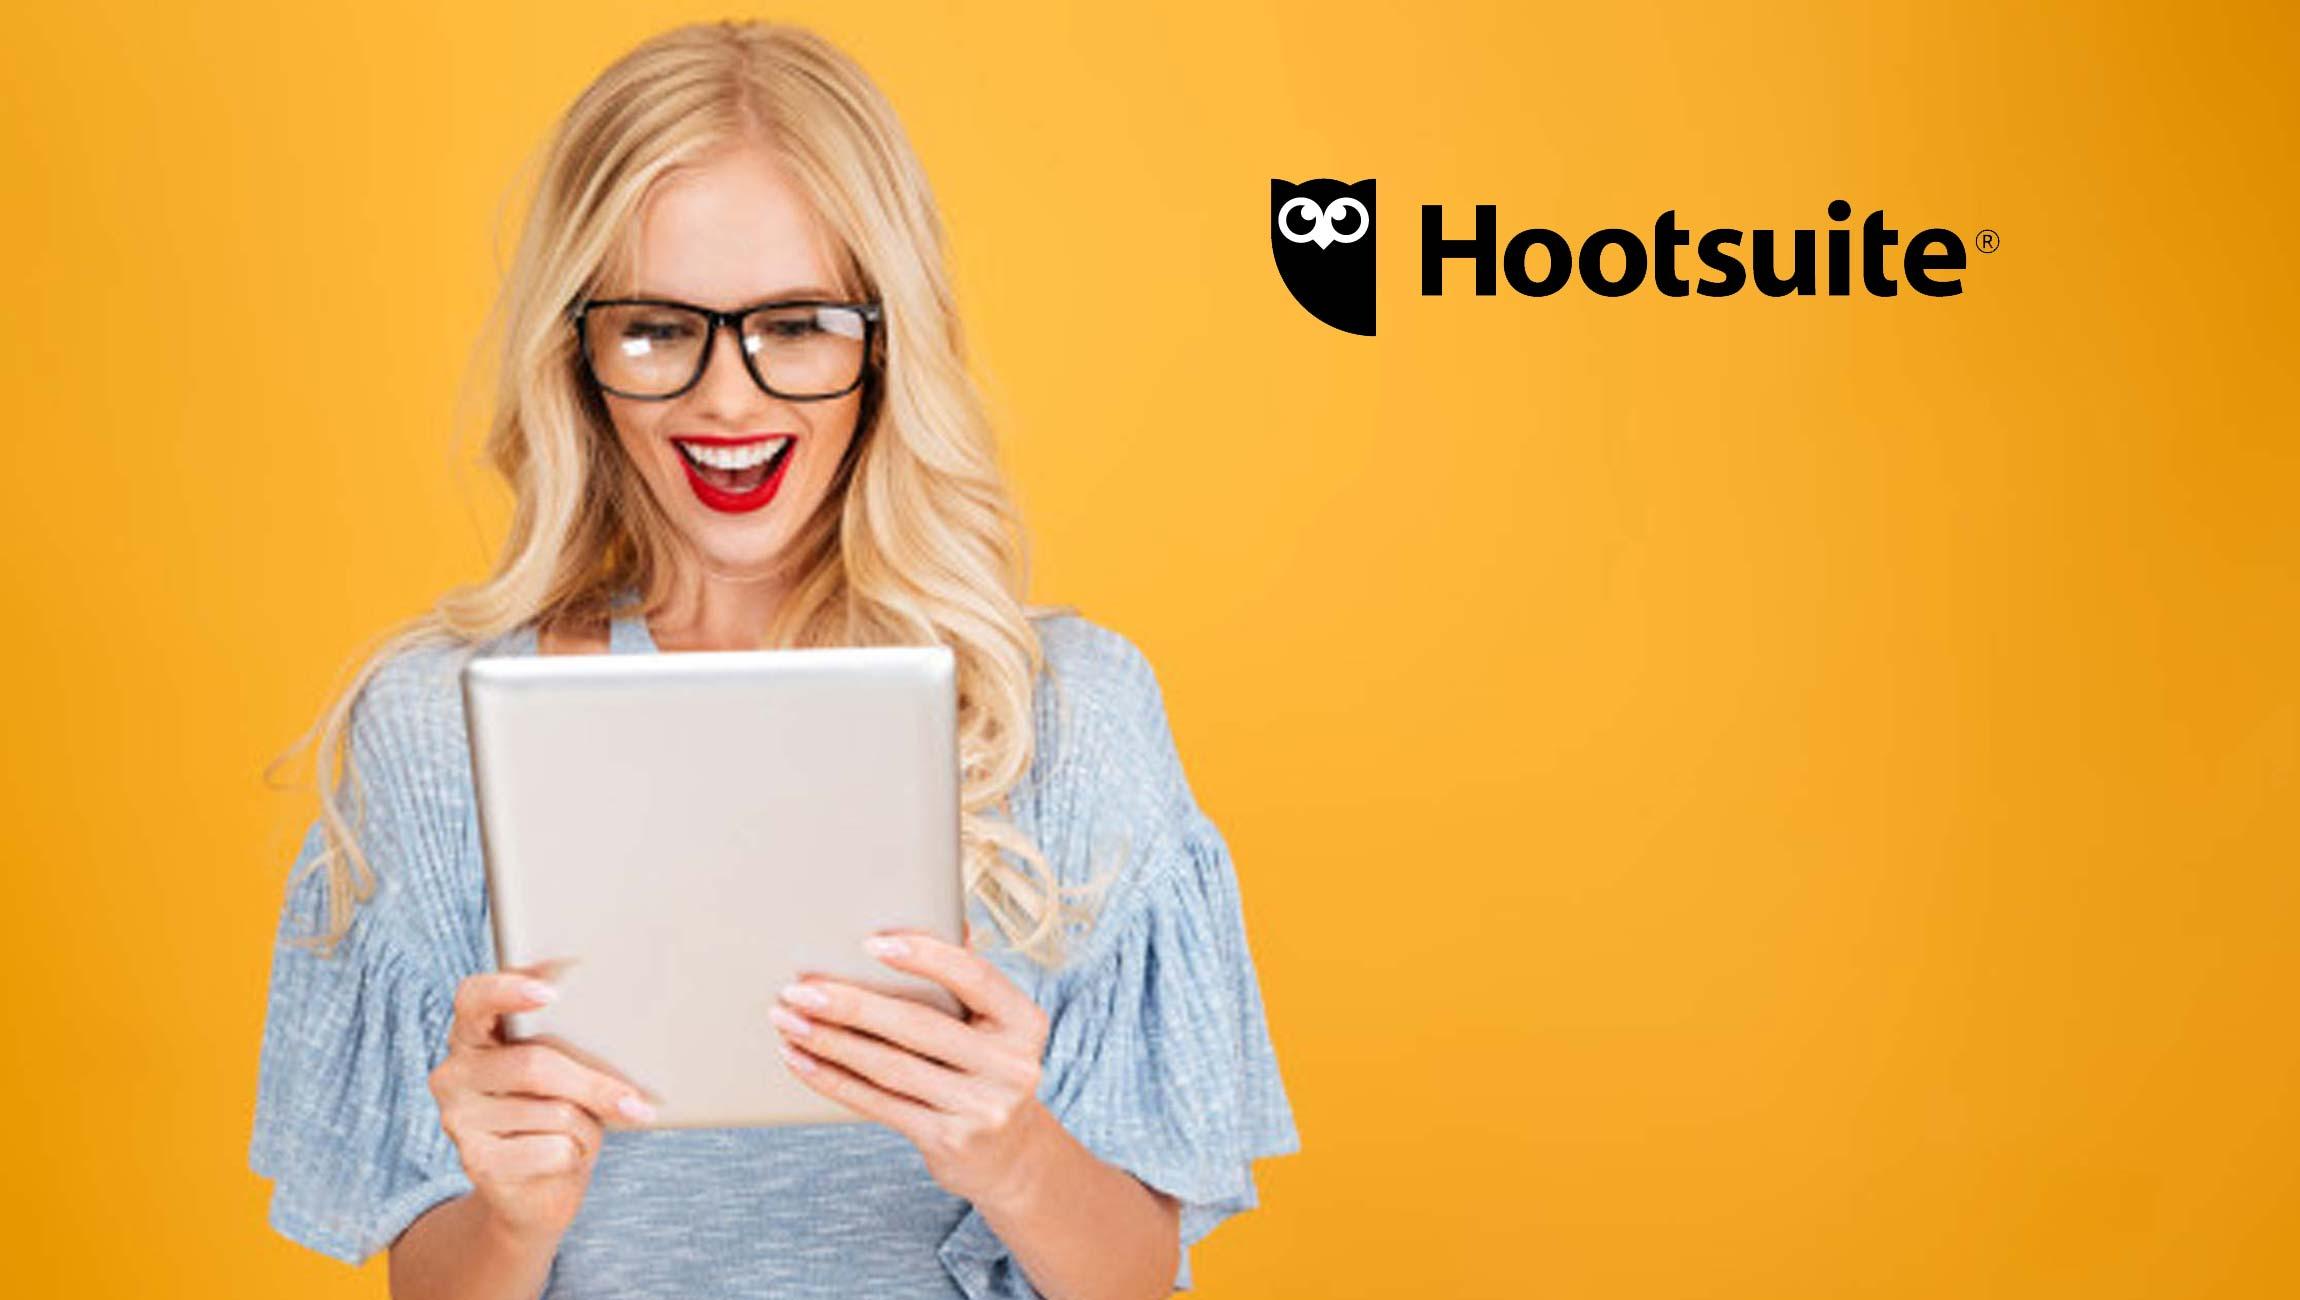 Hootsuite Acquires Leading Digital Customer Engagement Platform, Sparkcentral 1